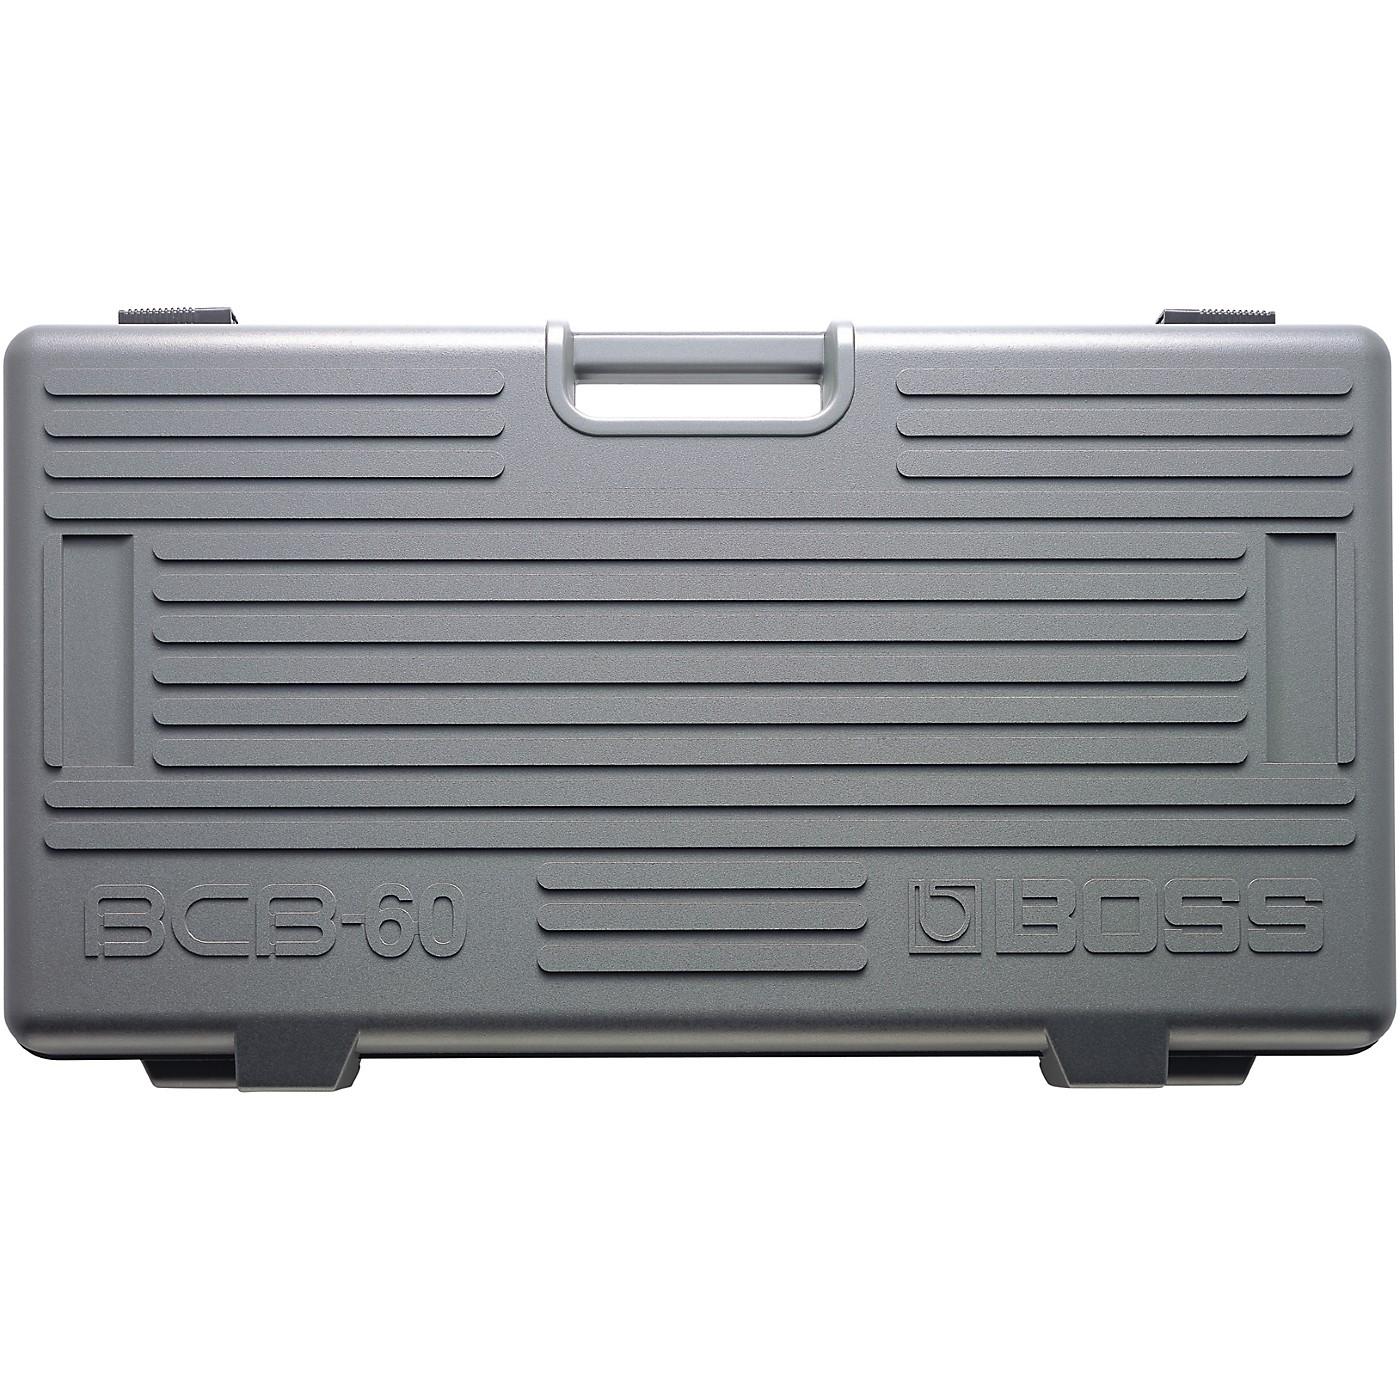 BOSS BCB-60 Pedalboard thumbnail